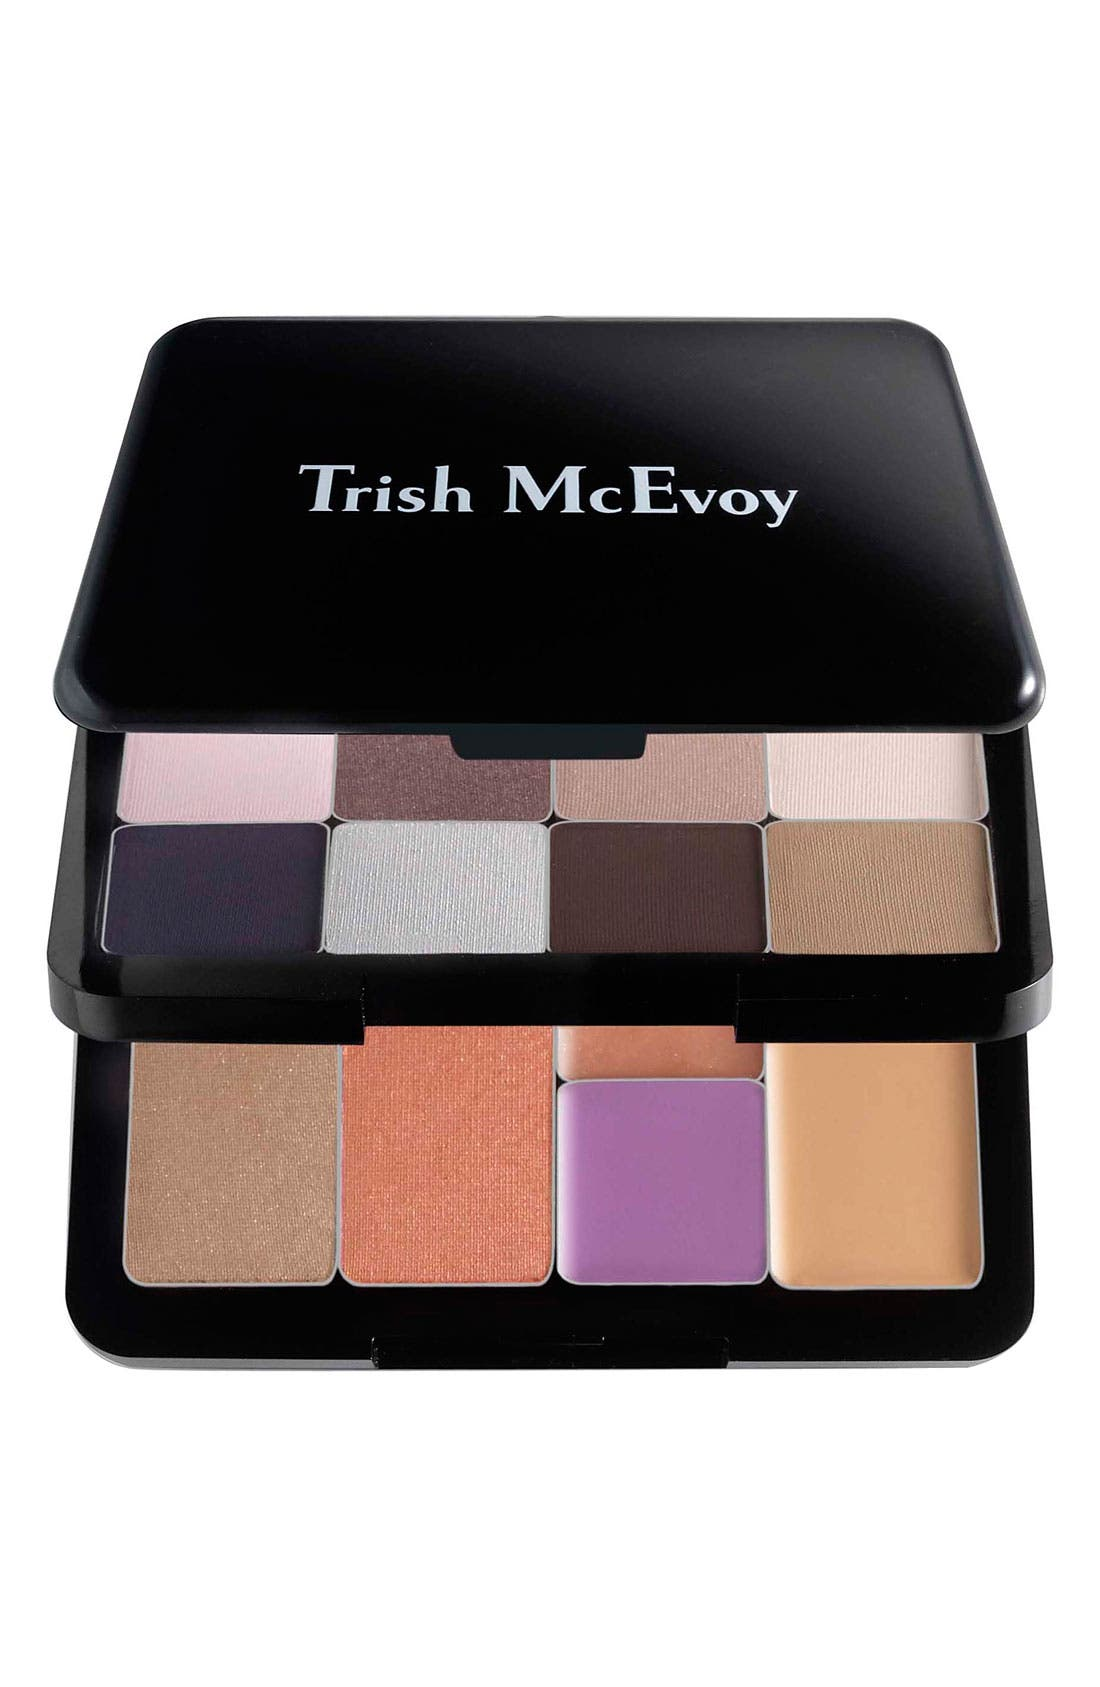 Alternate Image 1 Selected - Trish McEvoy 'Little Black Card® Effortless Beauty' Gift Set